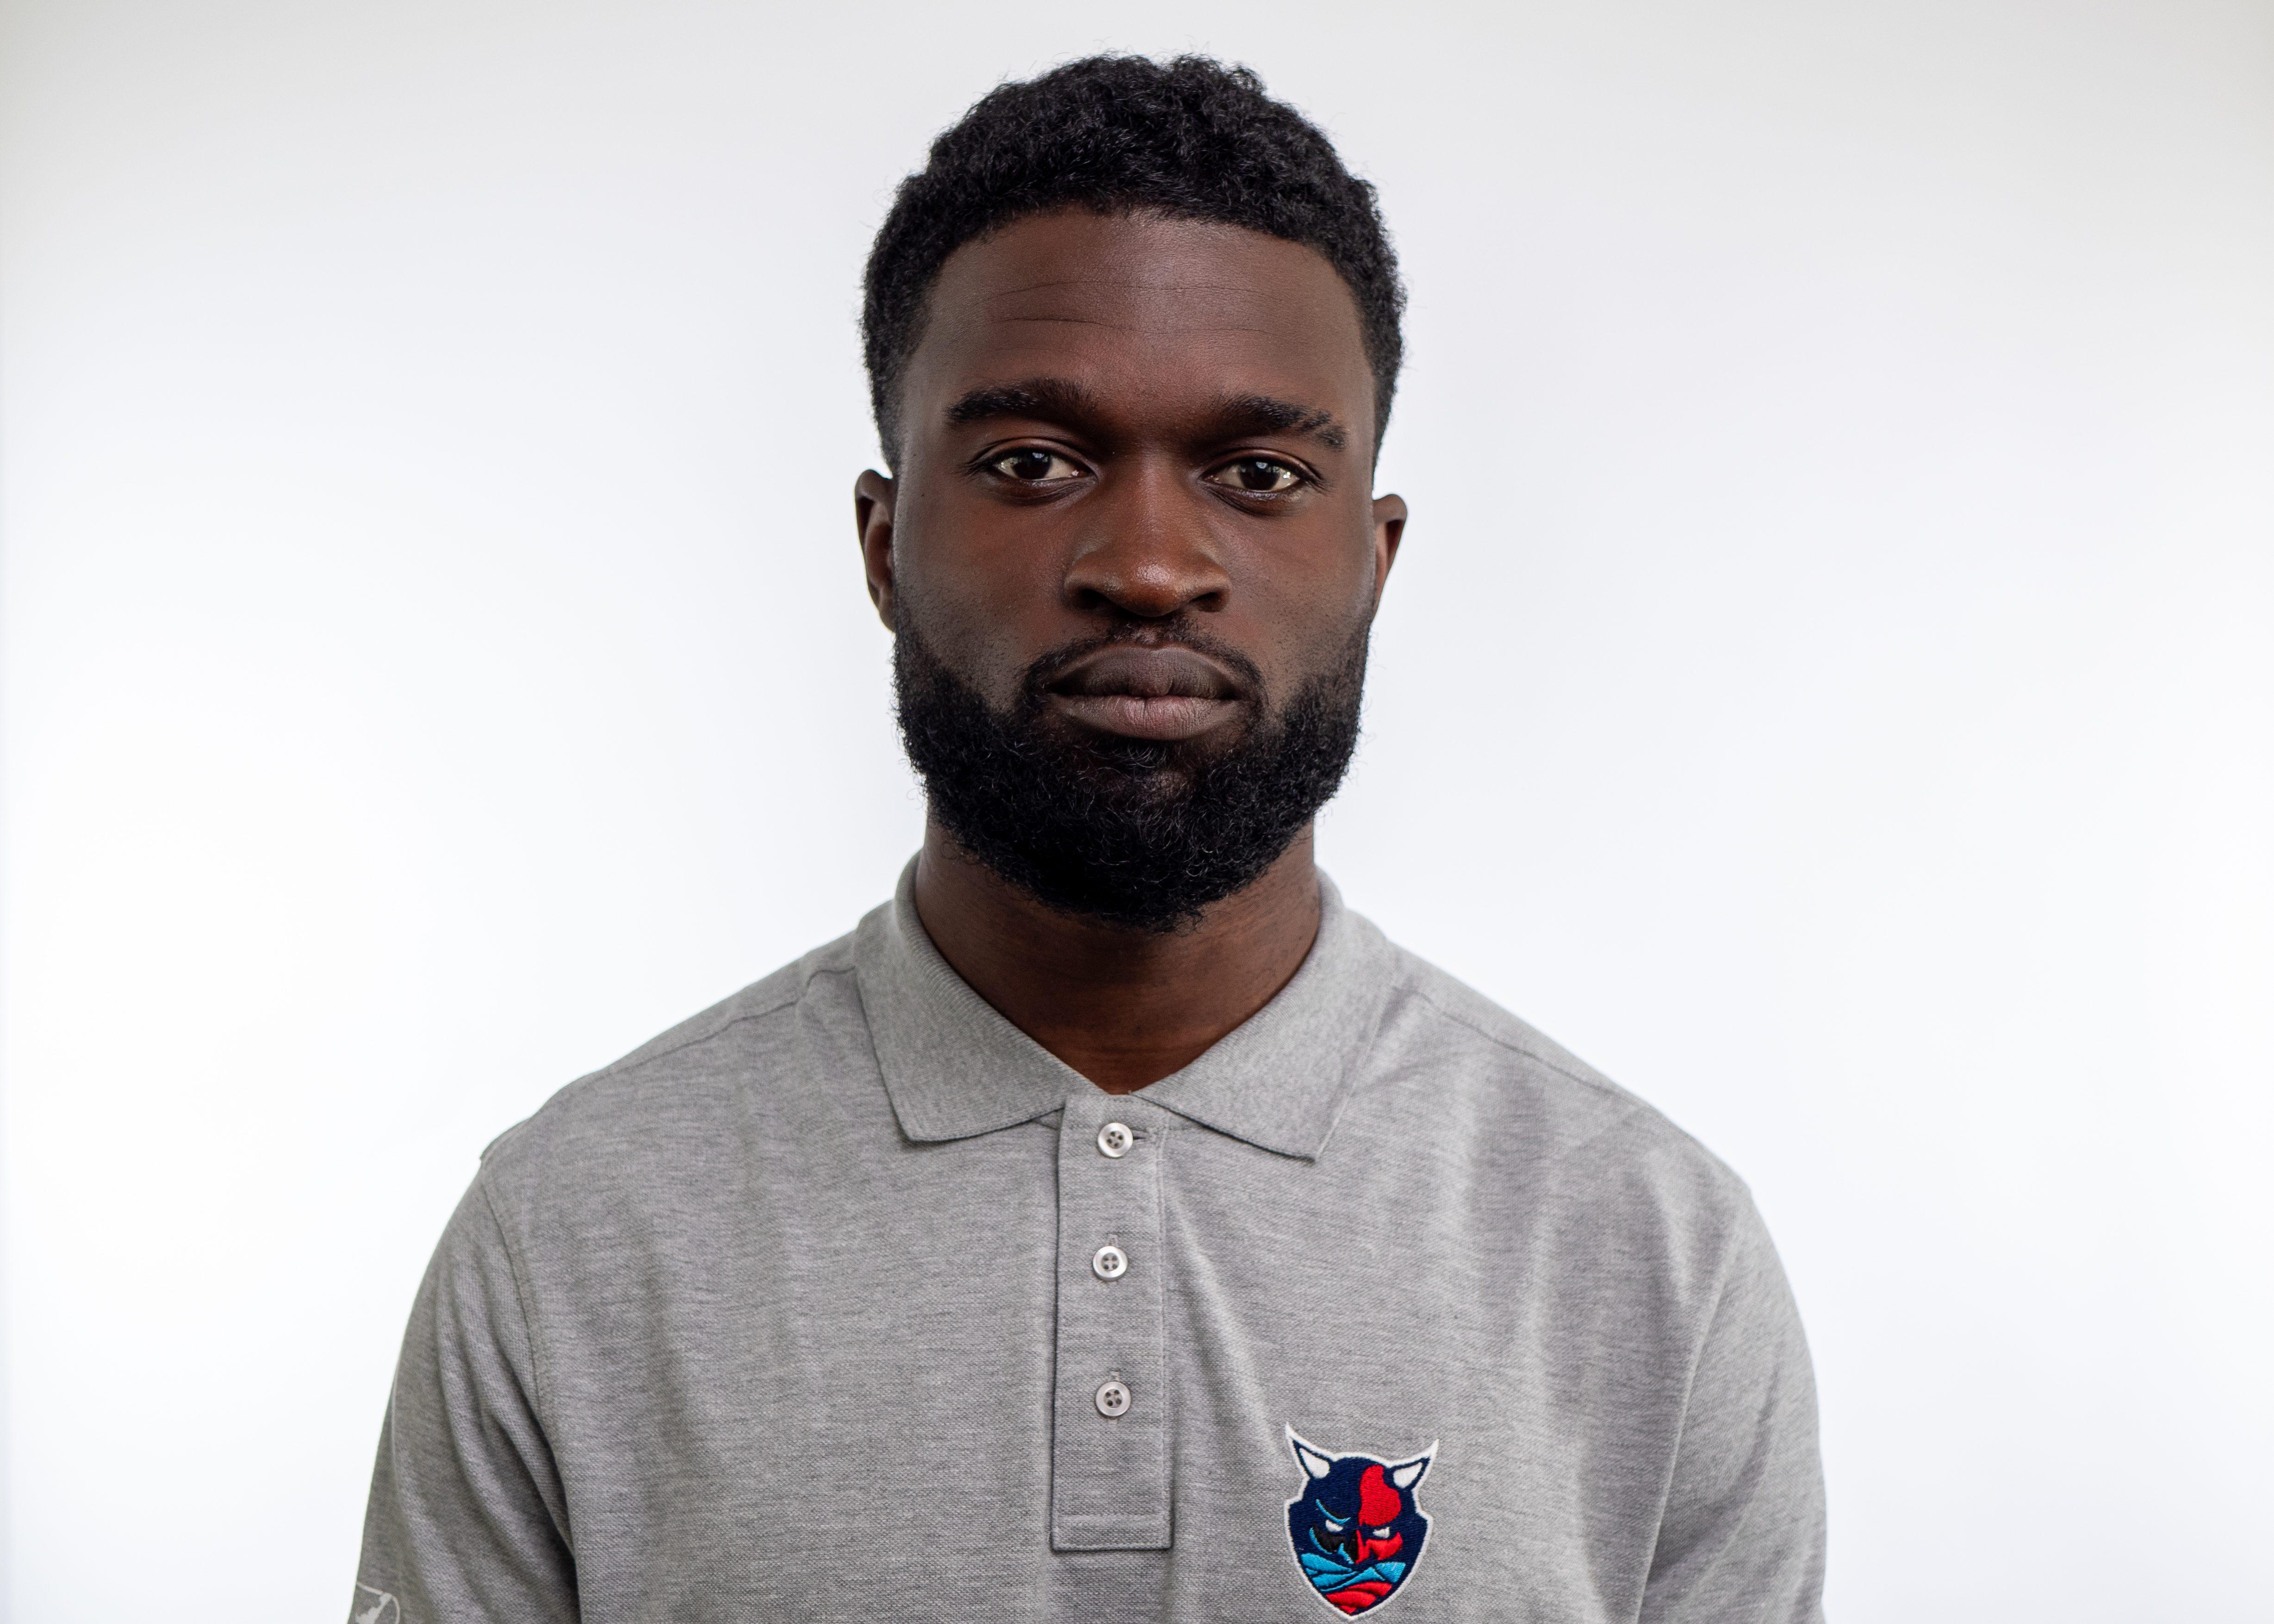 Dominic Yaw Aboagye-Duah